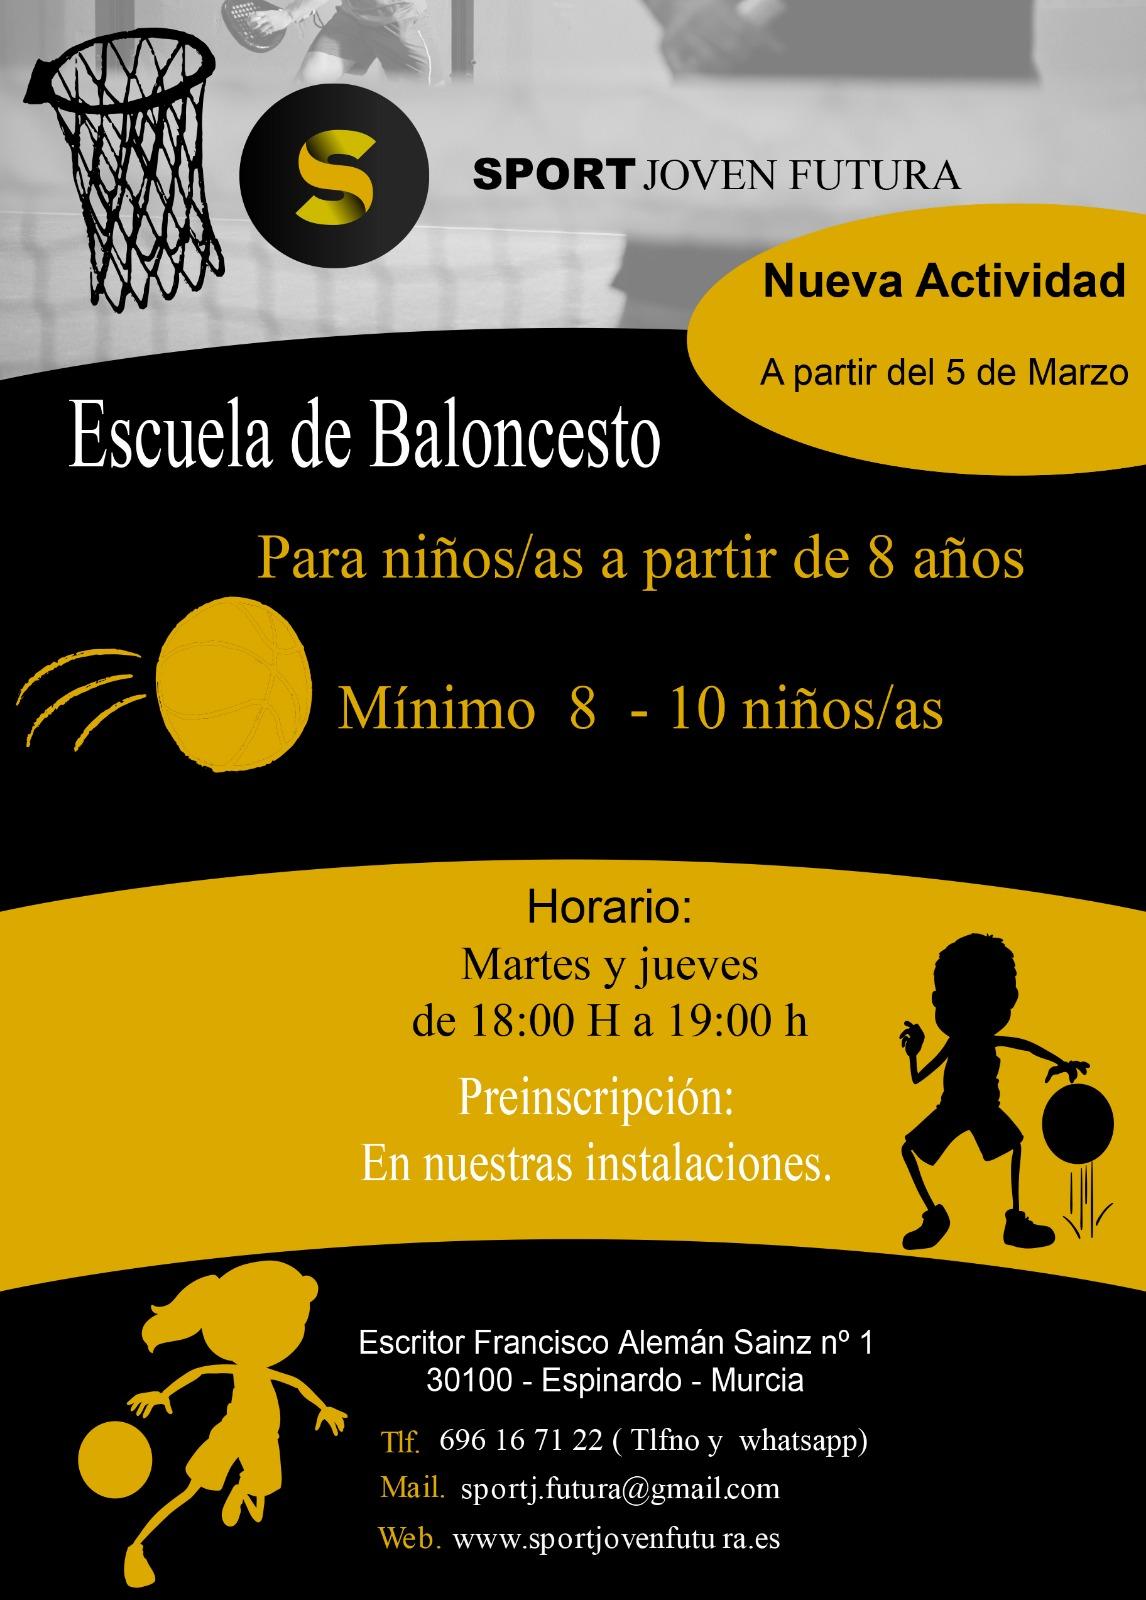 Escuela Baloncesto Sport Joven Futura